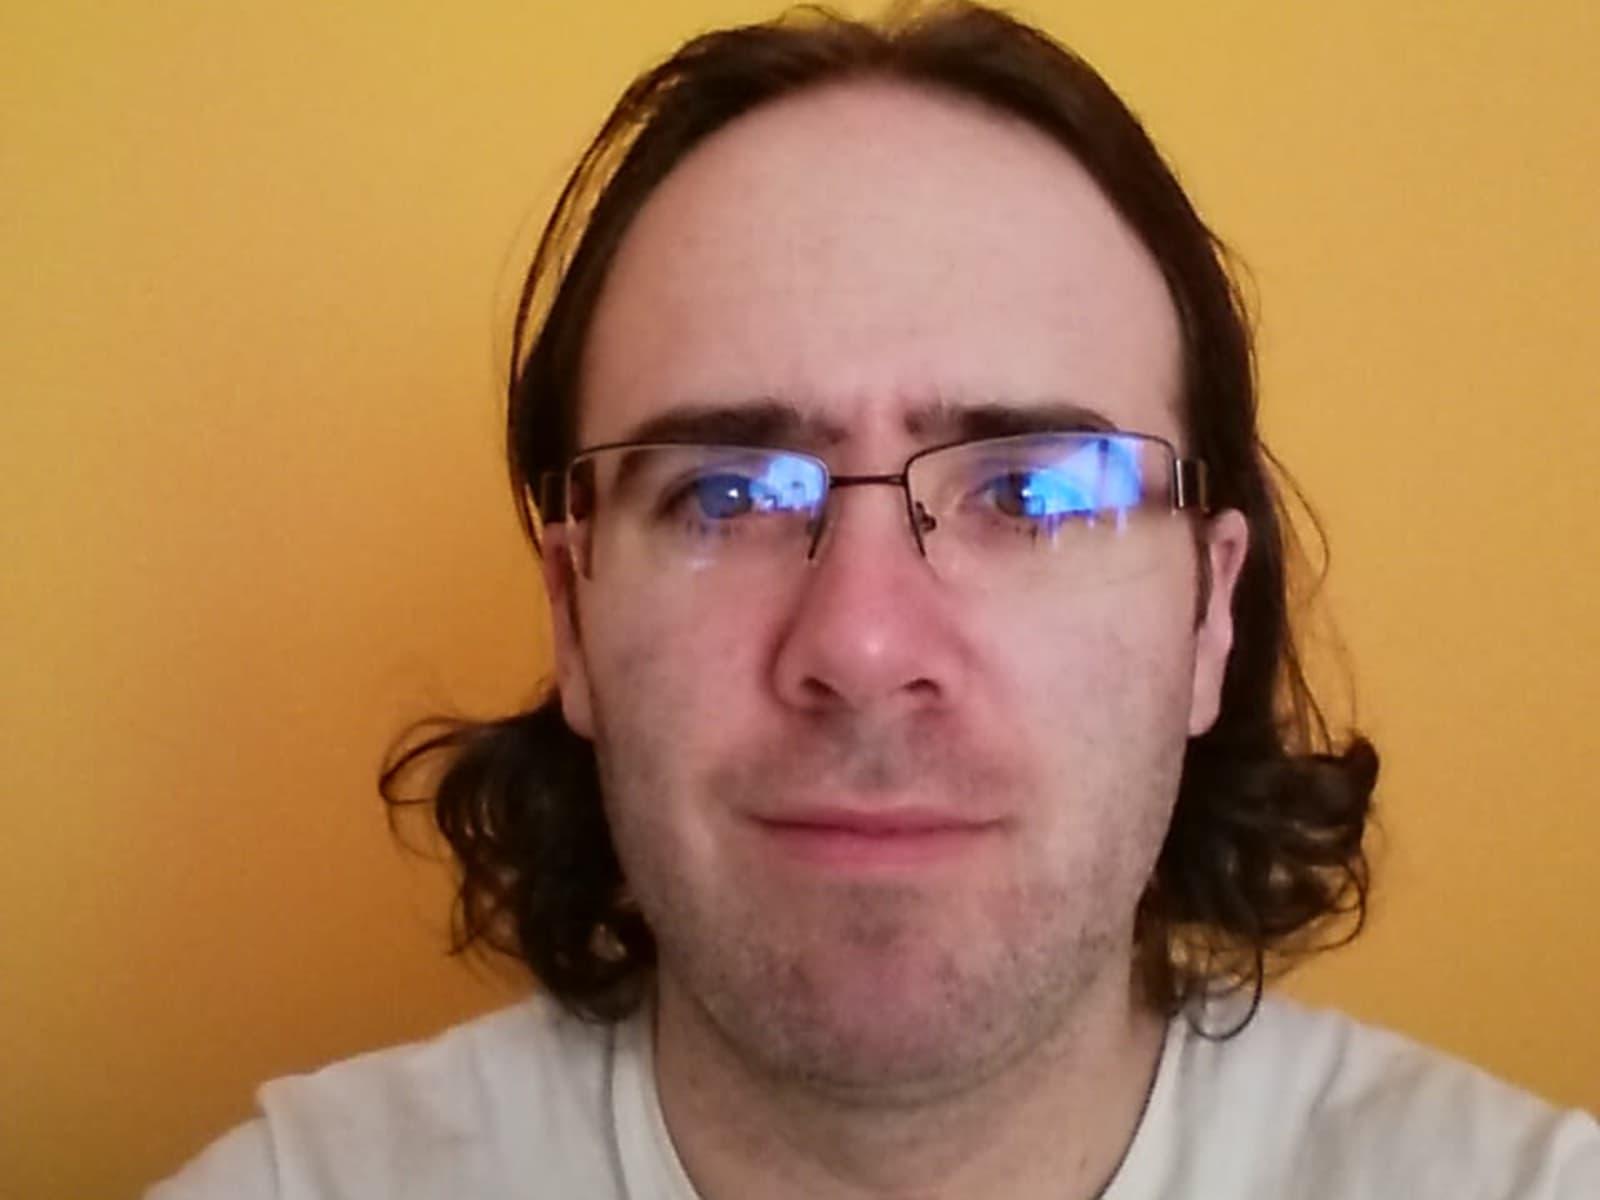 Daniel from Pamplona, Spain